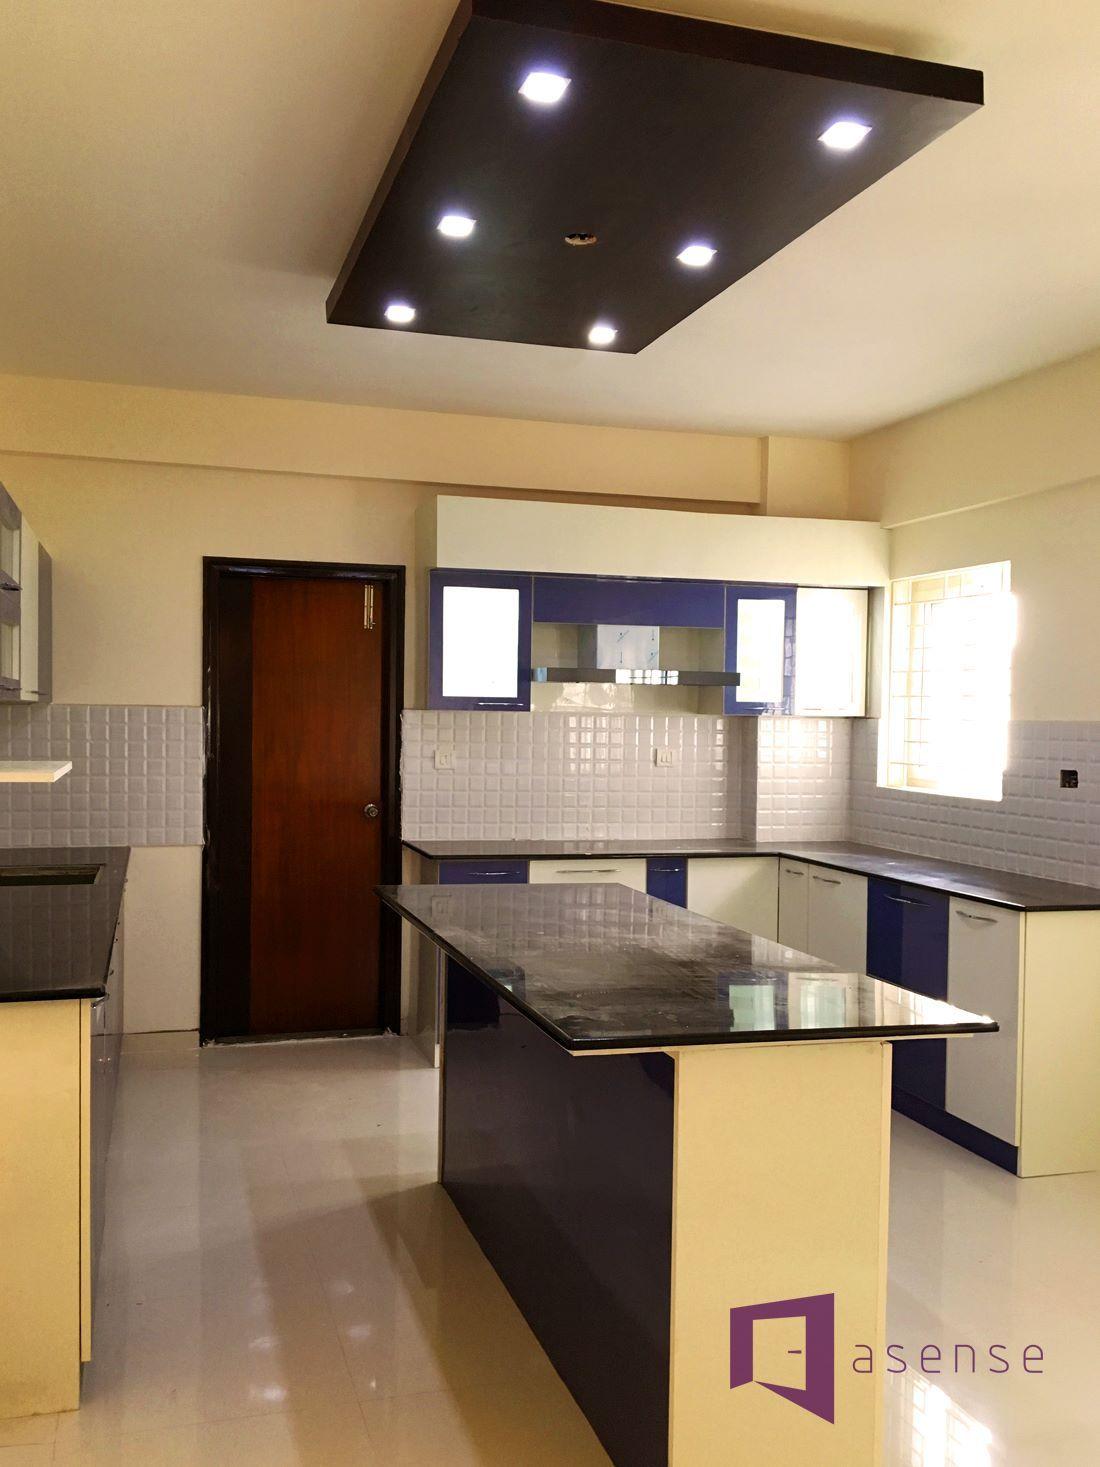 Modular Kitchen 6 X 8 Kitchen Interior Ideas Home Decor Kitchen